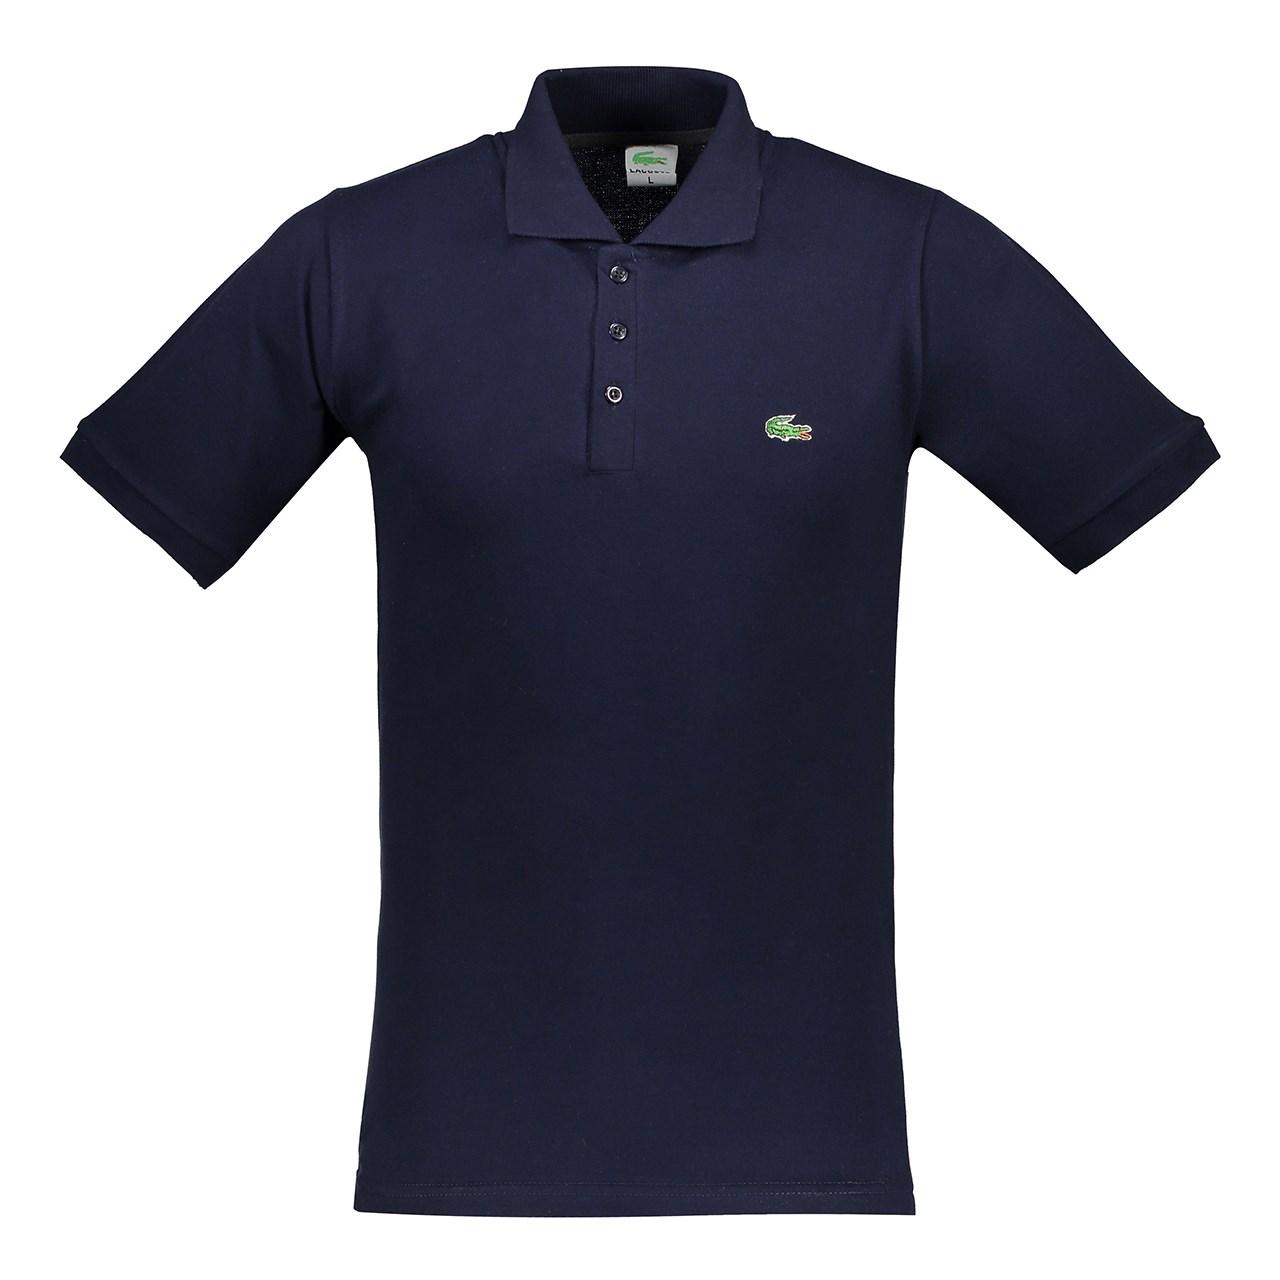 پولو شرت مردانه آترین مدل Lacoste 017